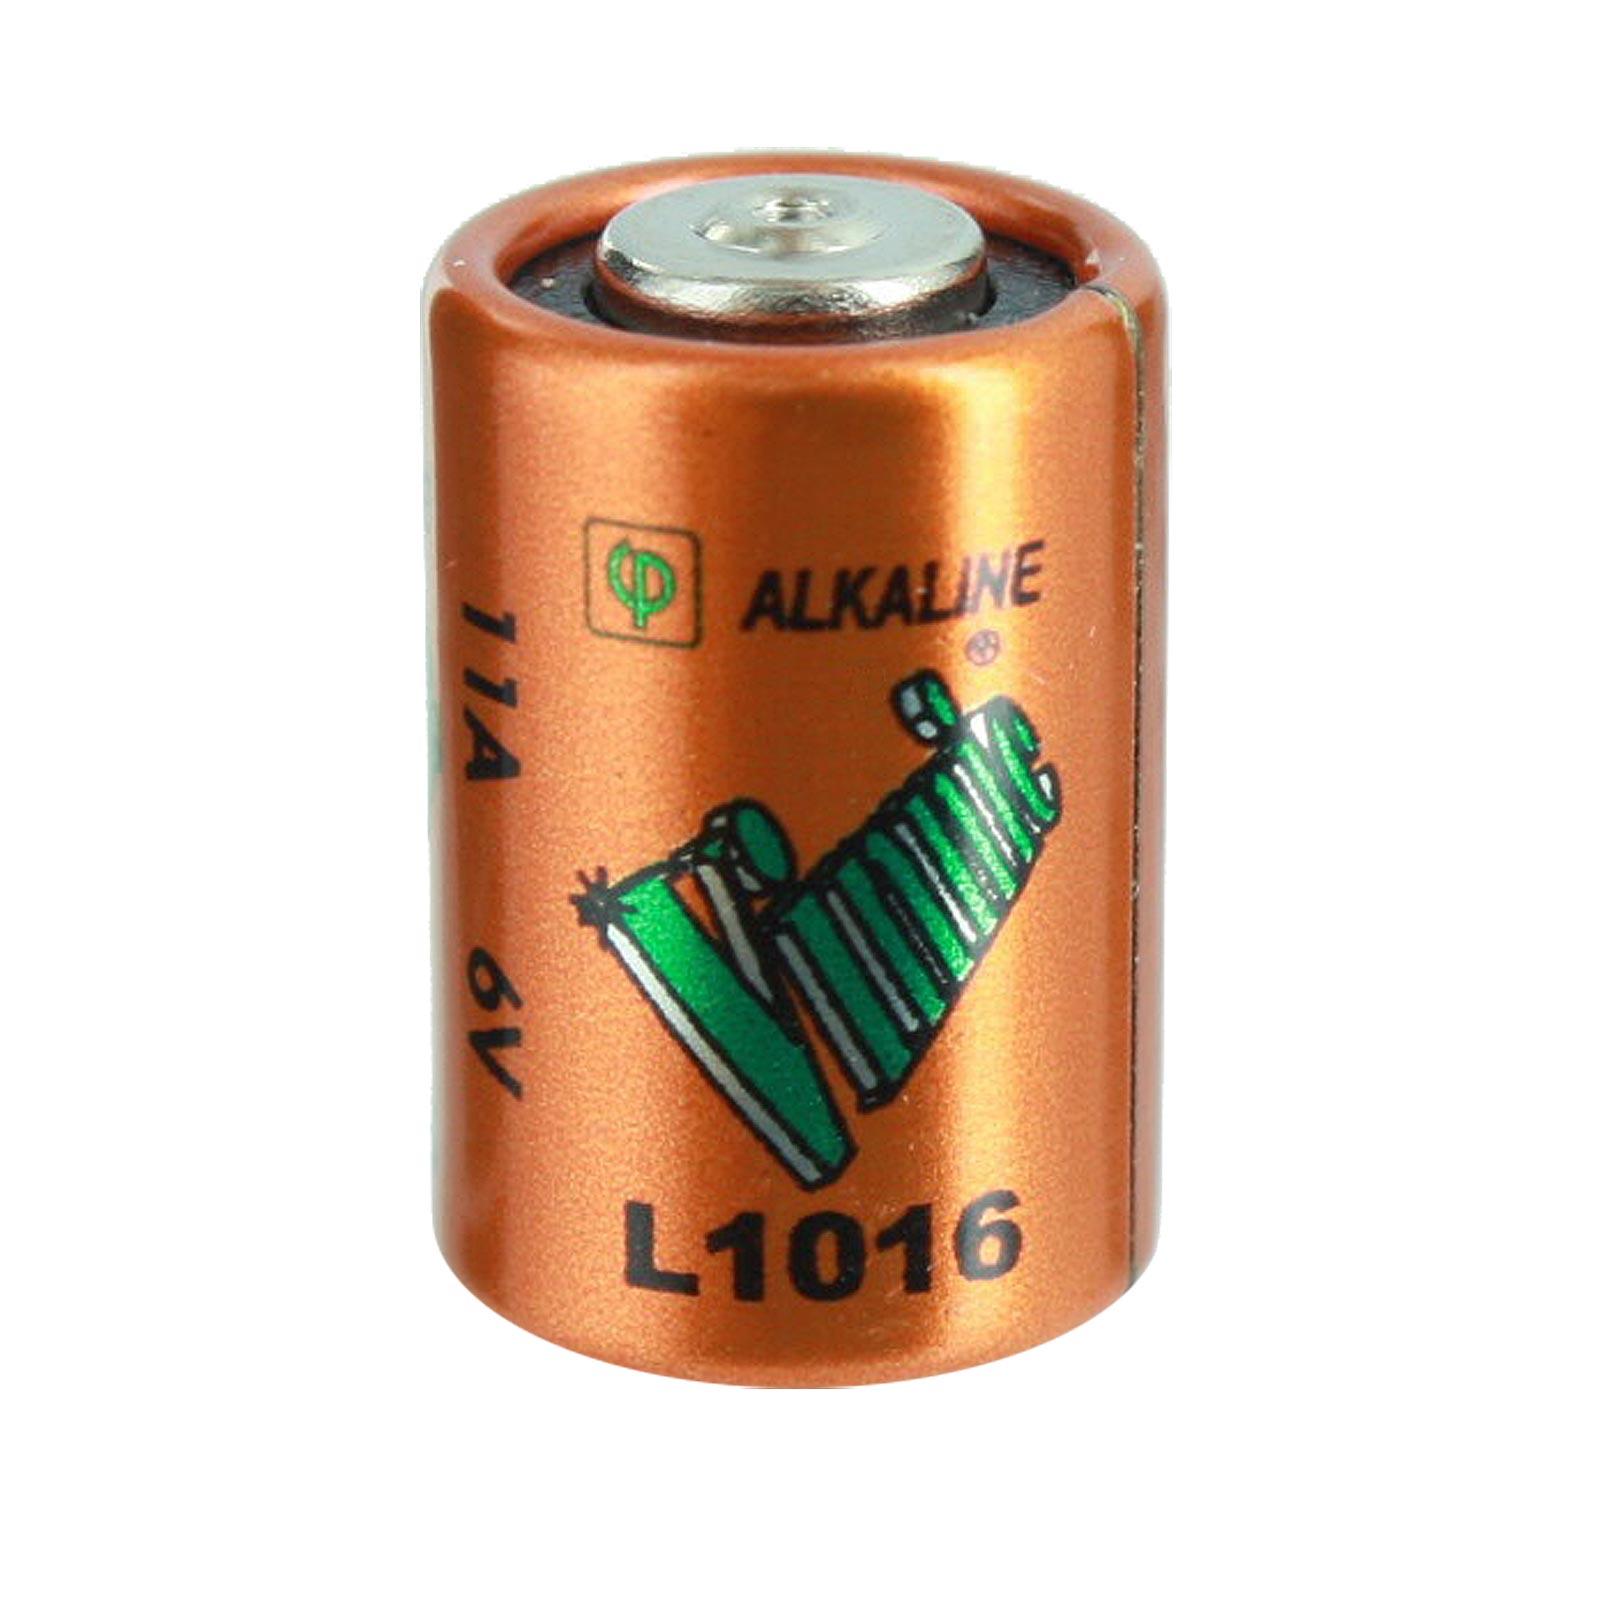 6v Alkaline Battery 11a Gp11a L1016 A11 Mn11 Ag11